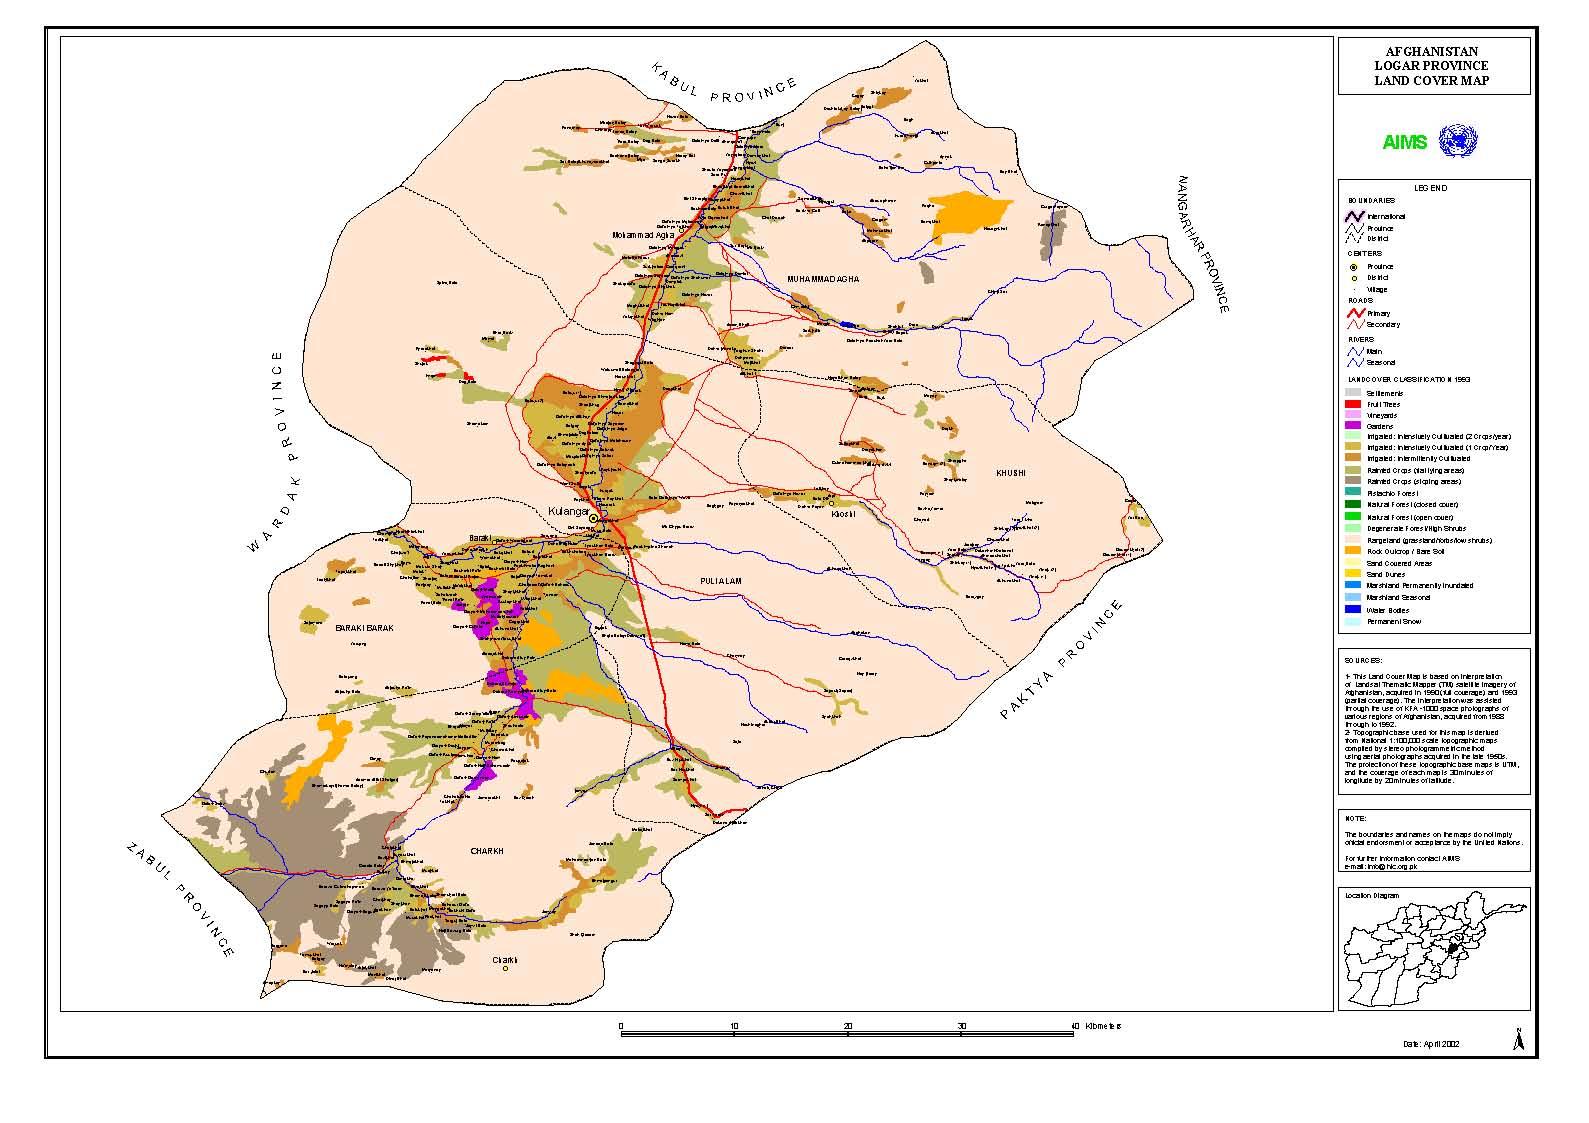 kunduz afghanistan map with Index E on Afghanistan Sat 29 Security Forces besides File Ghazni City  2010 in addition E9 98 BF E5 AF 8C E6 B1 97 E8 A1 8C E6 94 BF E5 8D 80 E5 8A 83 furthermore Afghanistan likewise Afghanistan Waehlen Unter Terror Und Zensur.